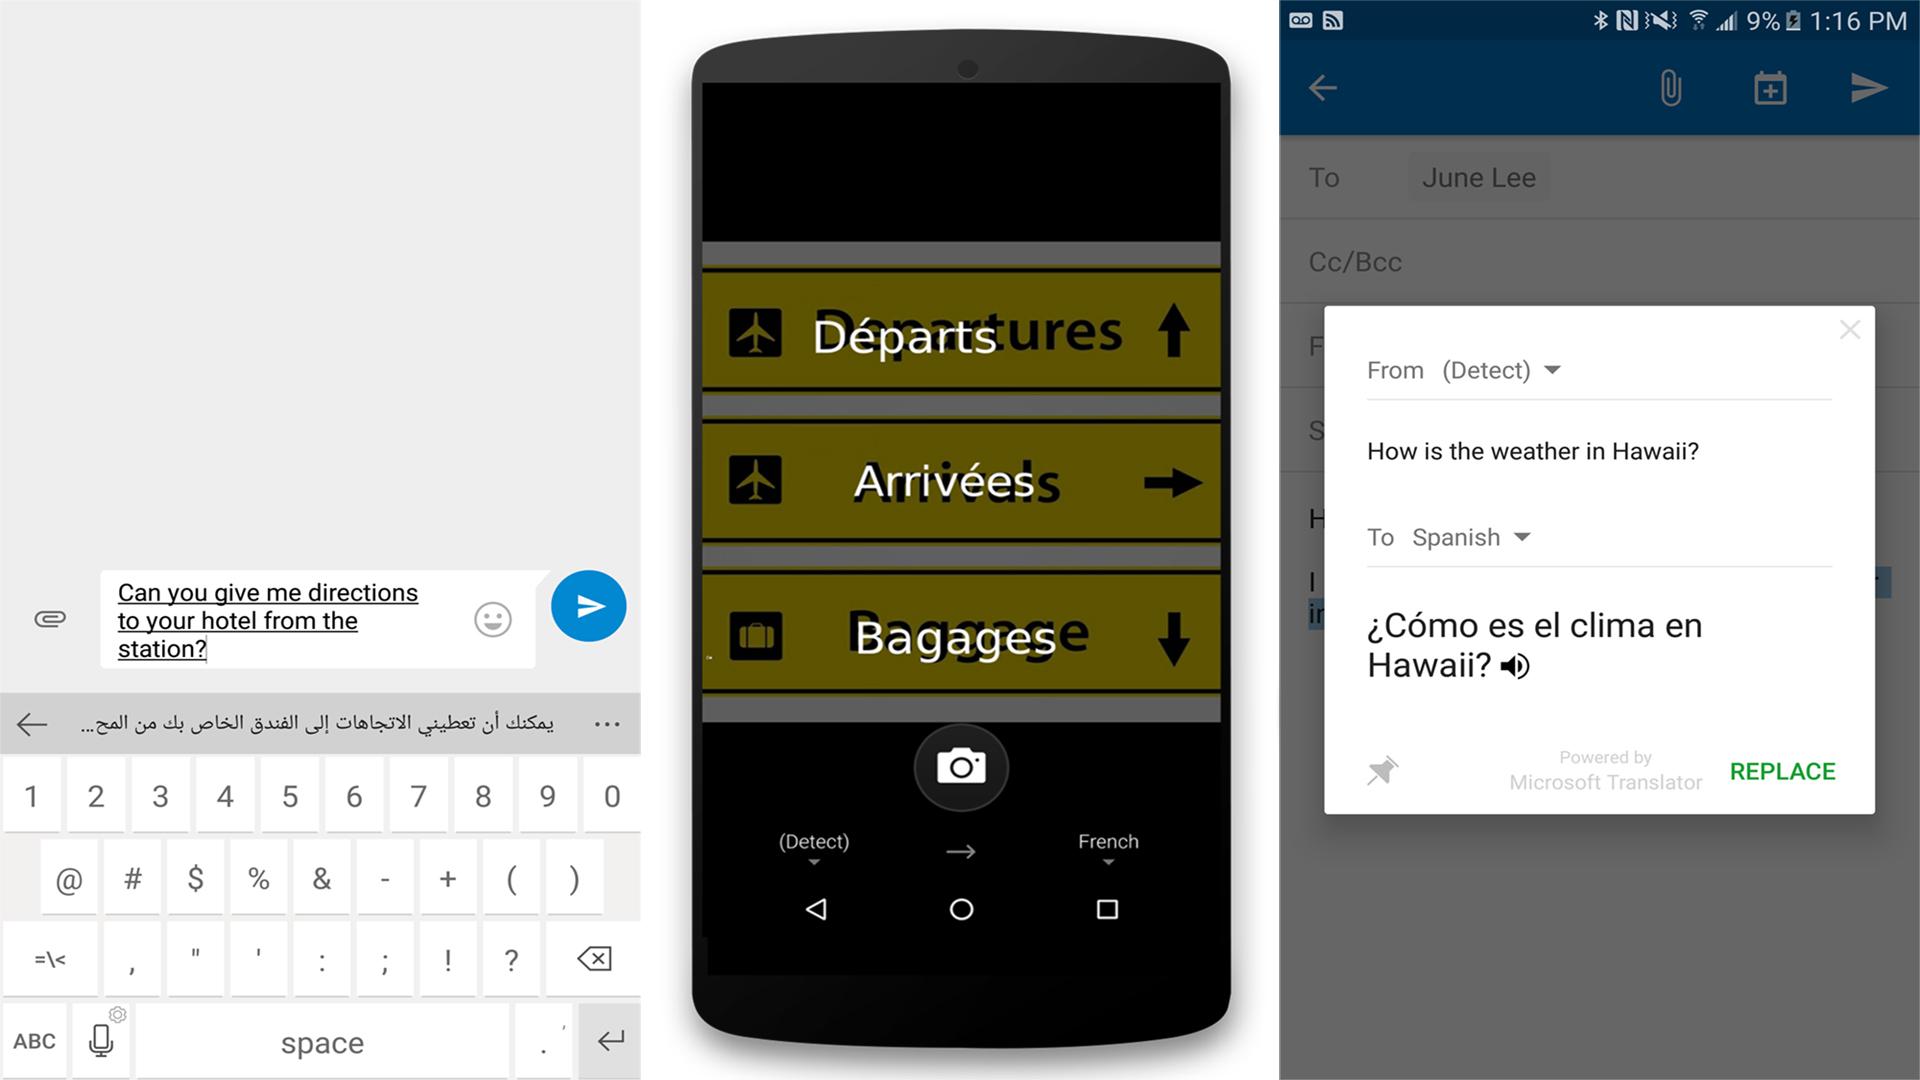 English To Italian Translator Google: Microsoft Adds Image And Inline Translation To Its